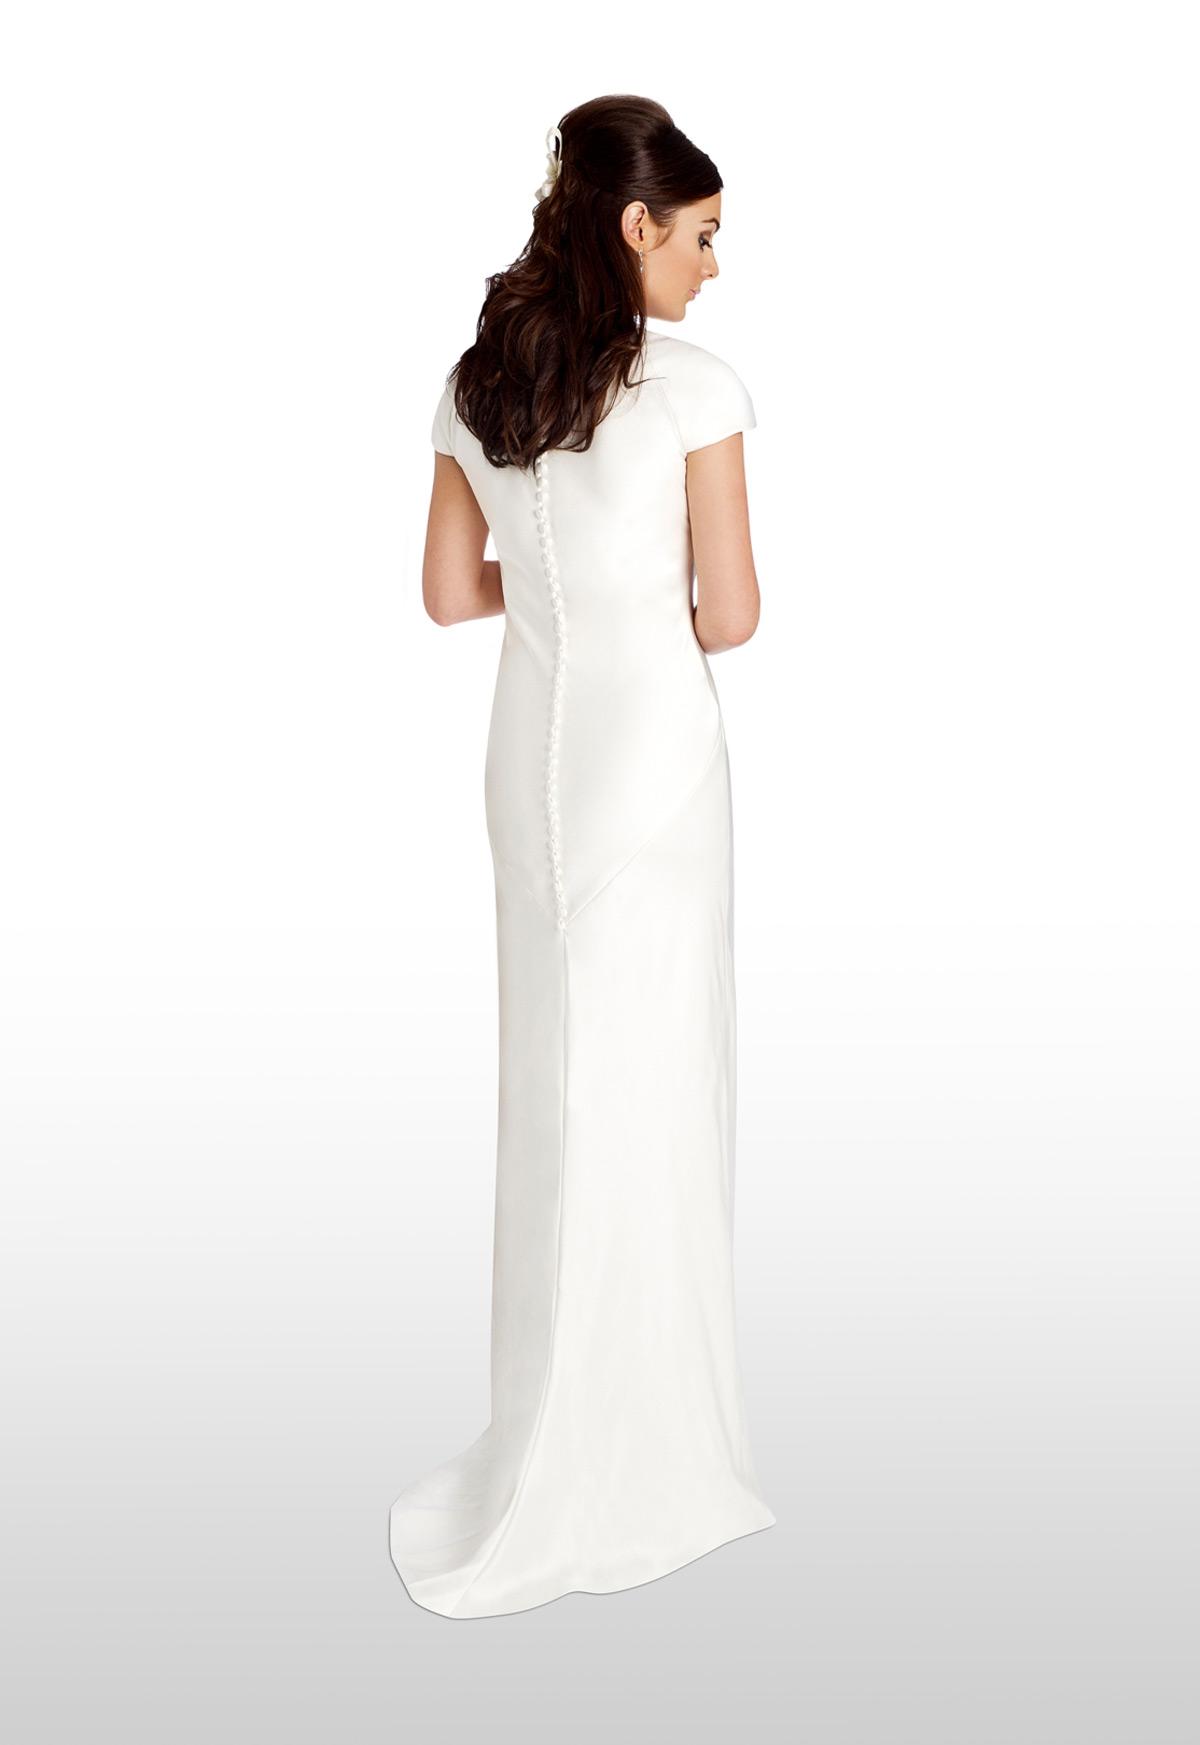 Pippa Middleton S Royal Wedding Dress Replica Goes On Sale